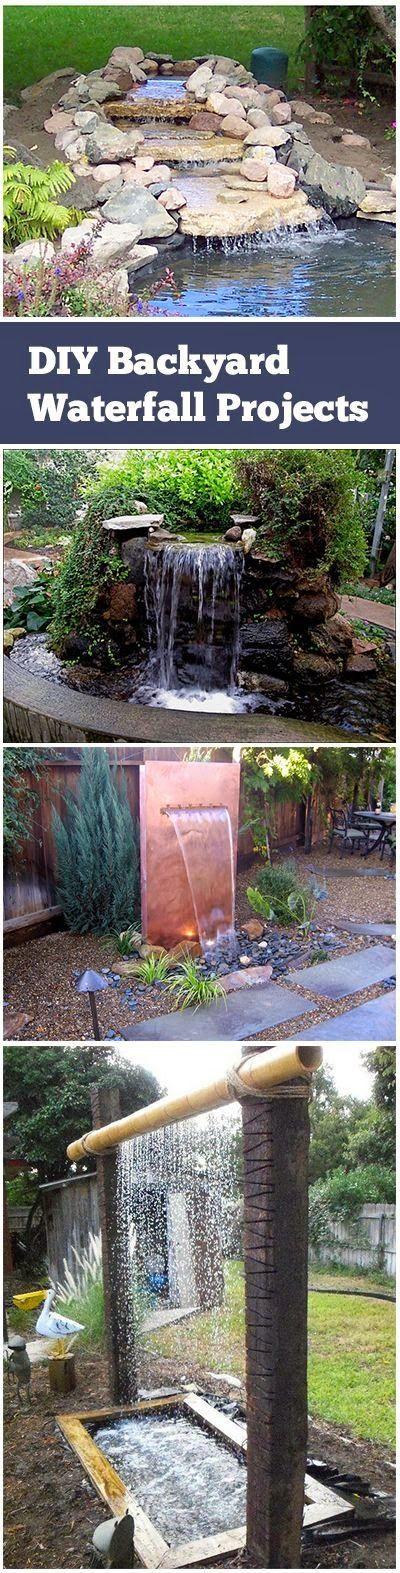 G 4 Gardening: Bend, Oregon Landscaping Ideas